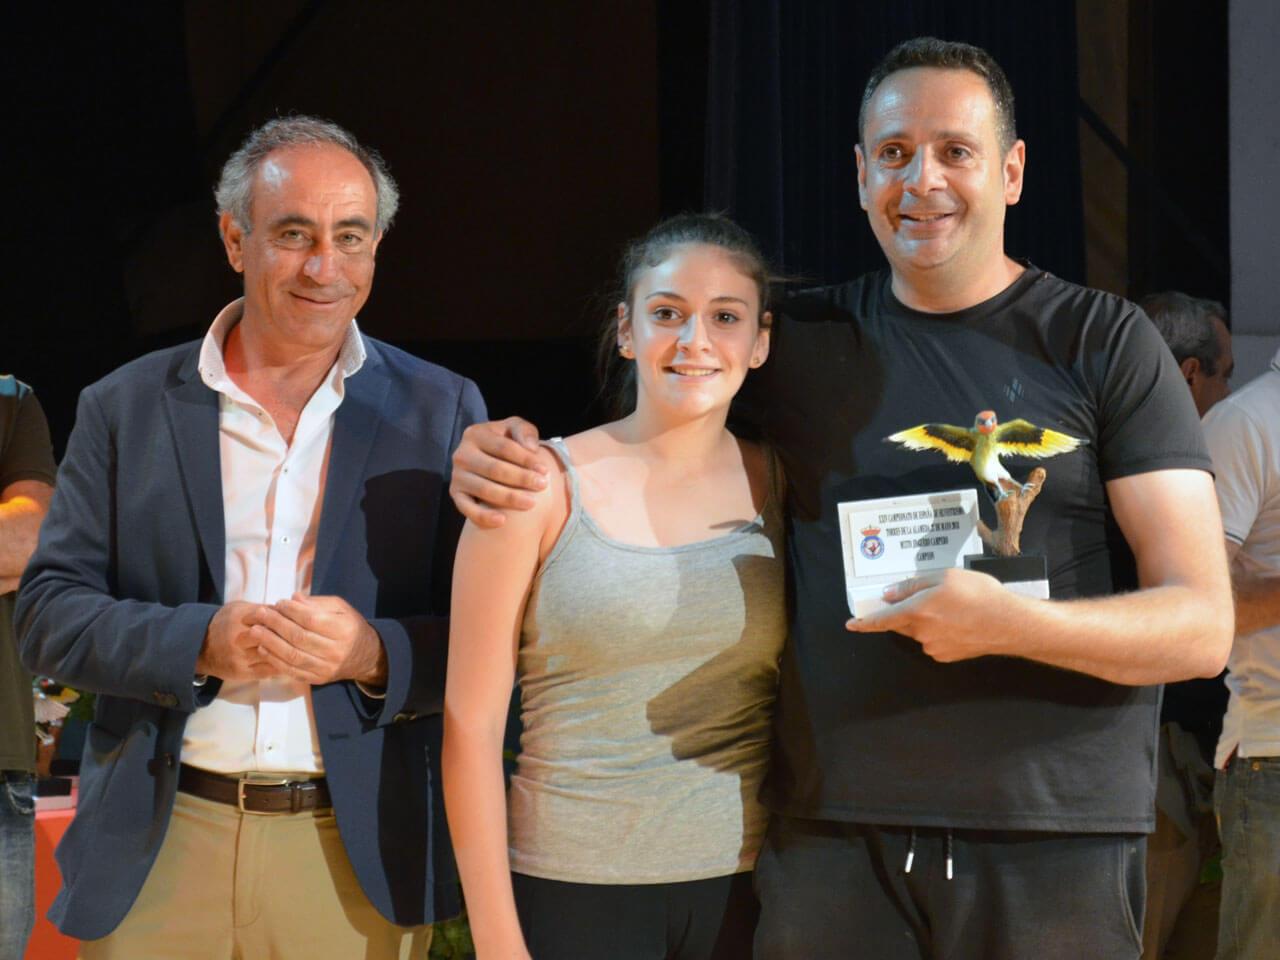 Campeonato España Cante 2018 - César Cebrián Campeon M Jilg